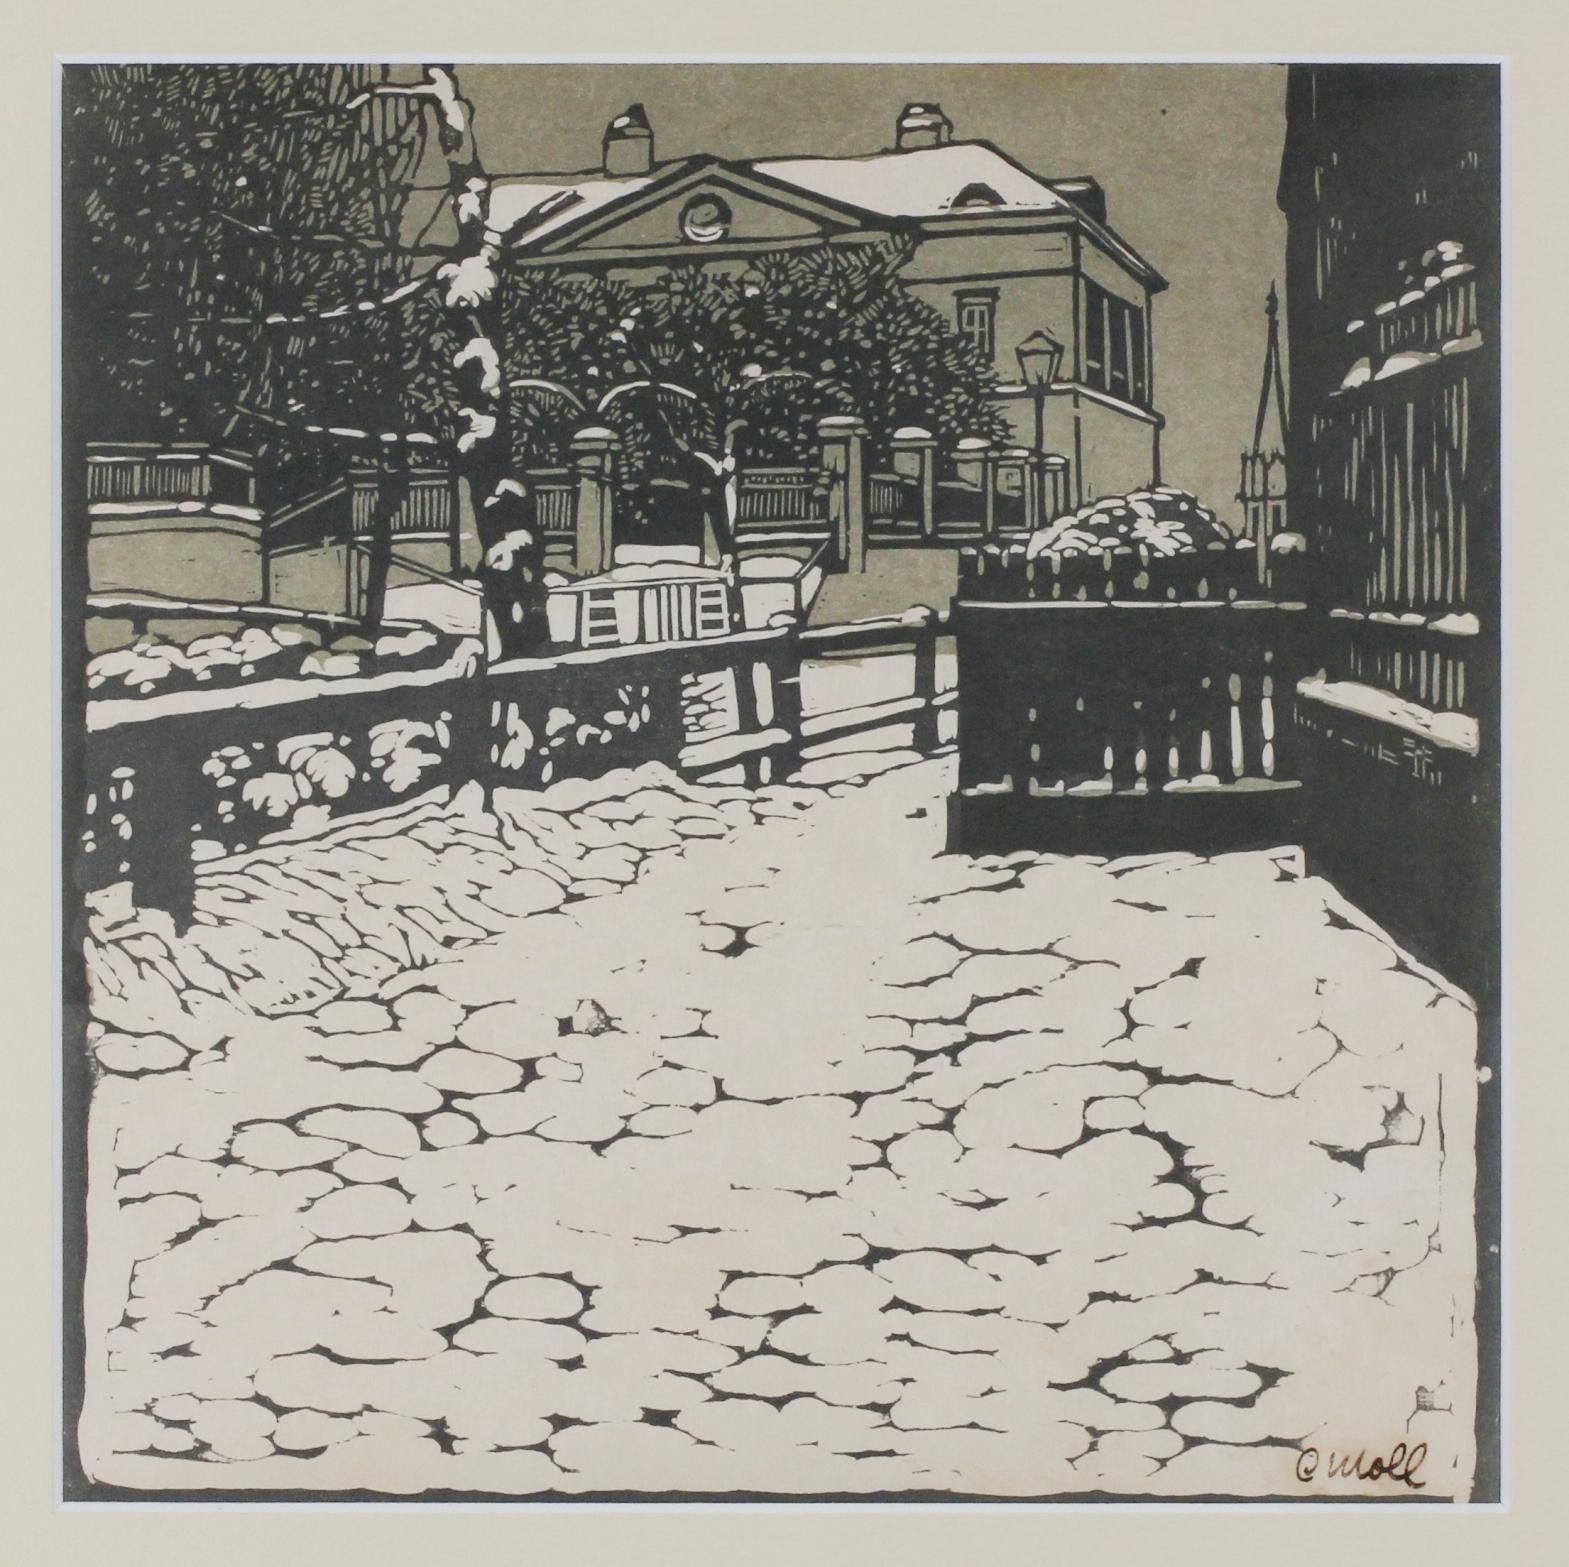 Galerie Hochdruck Farbholzschnitte Künstler M / color woodcuts artists M